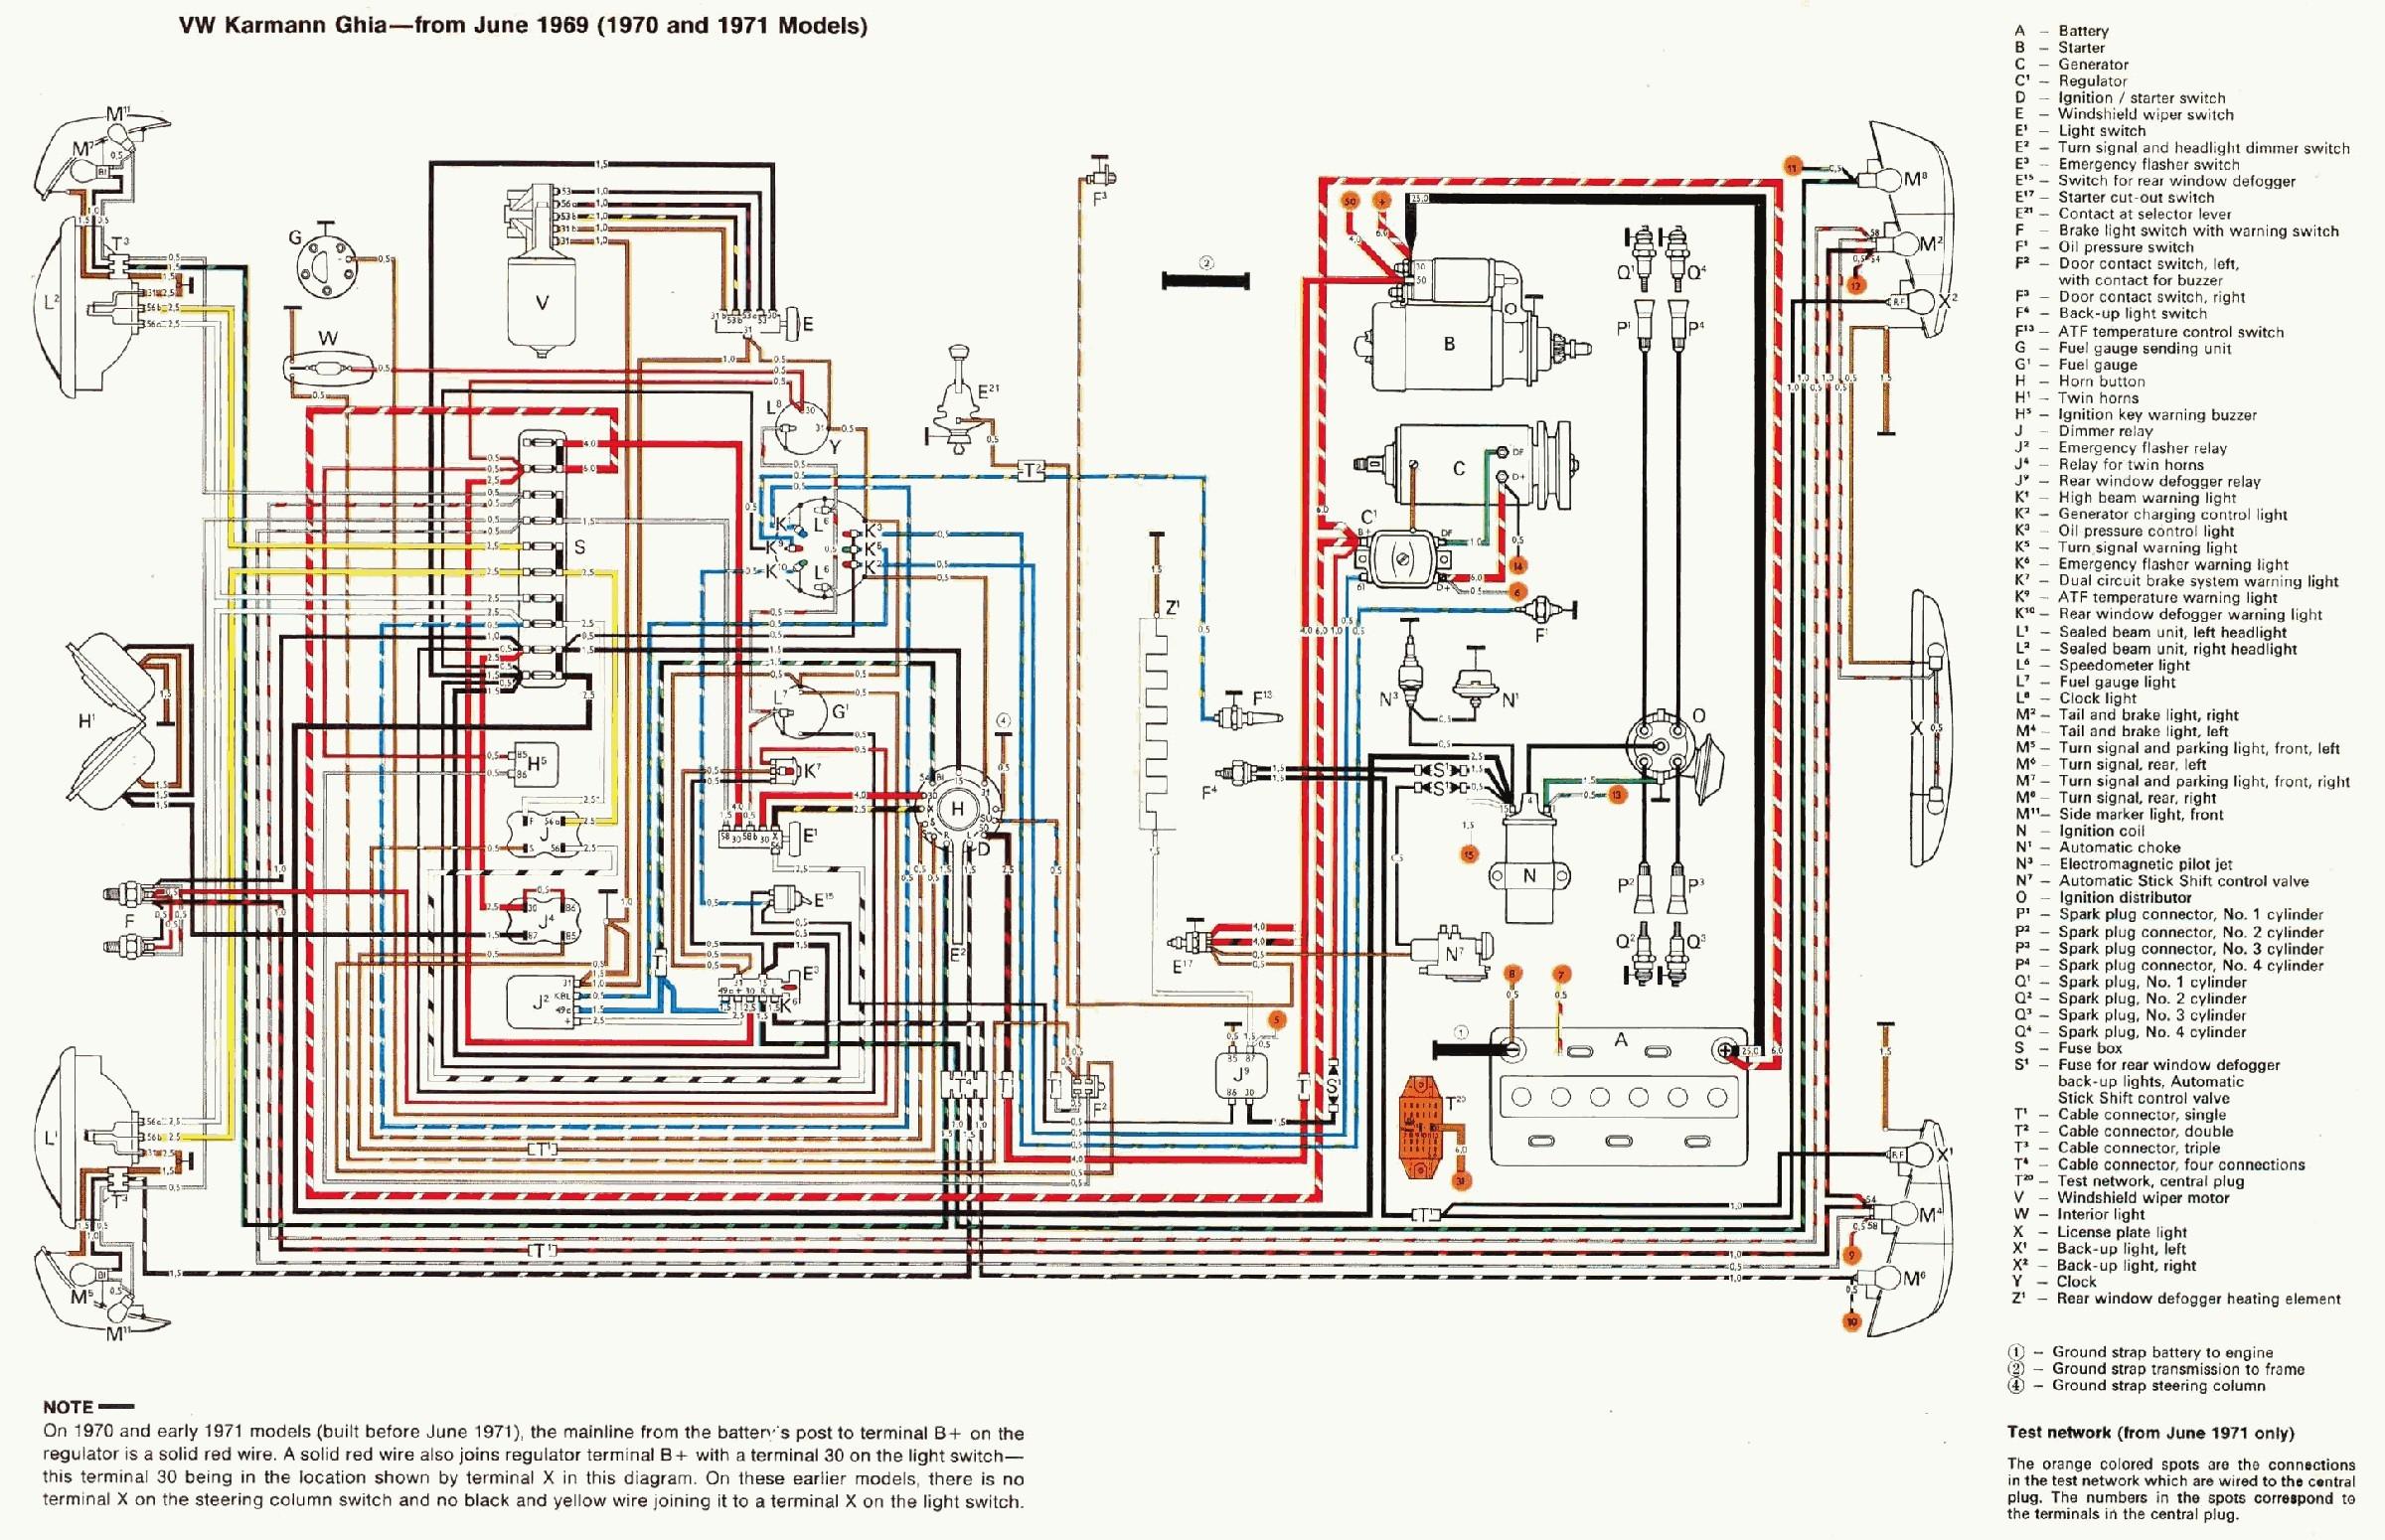 Fan Switch Wiring Diagram Along With Thomas Bus Wiring ... on 2002 ford taurus engine diagram, scr diagram, relay wiring diagram,